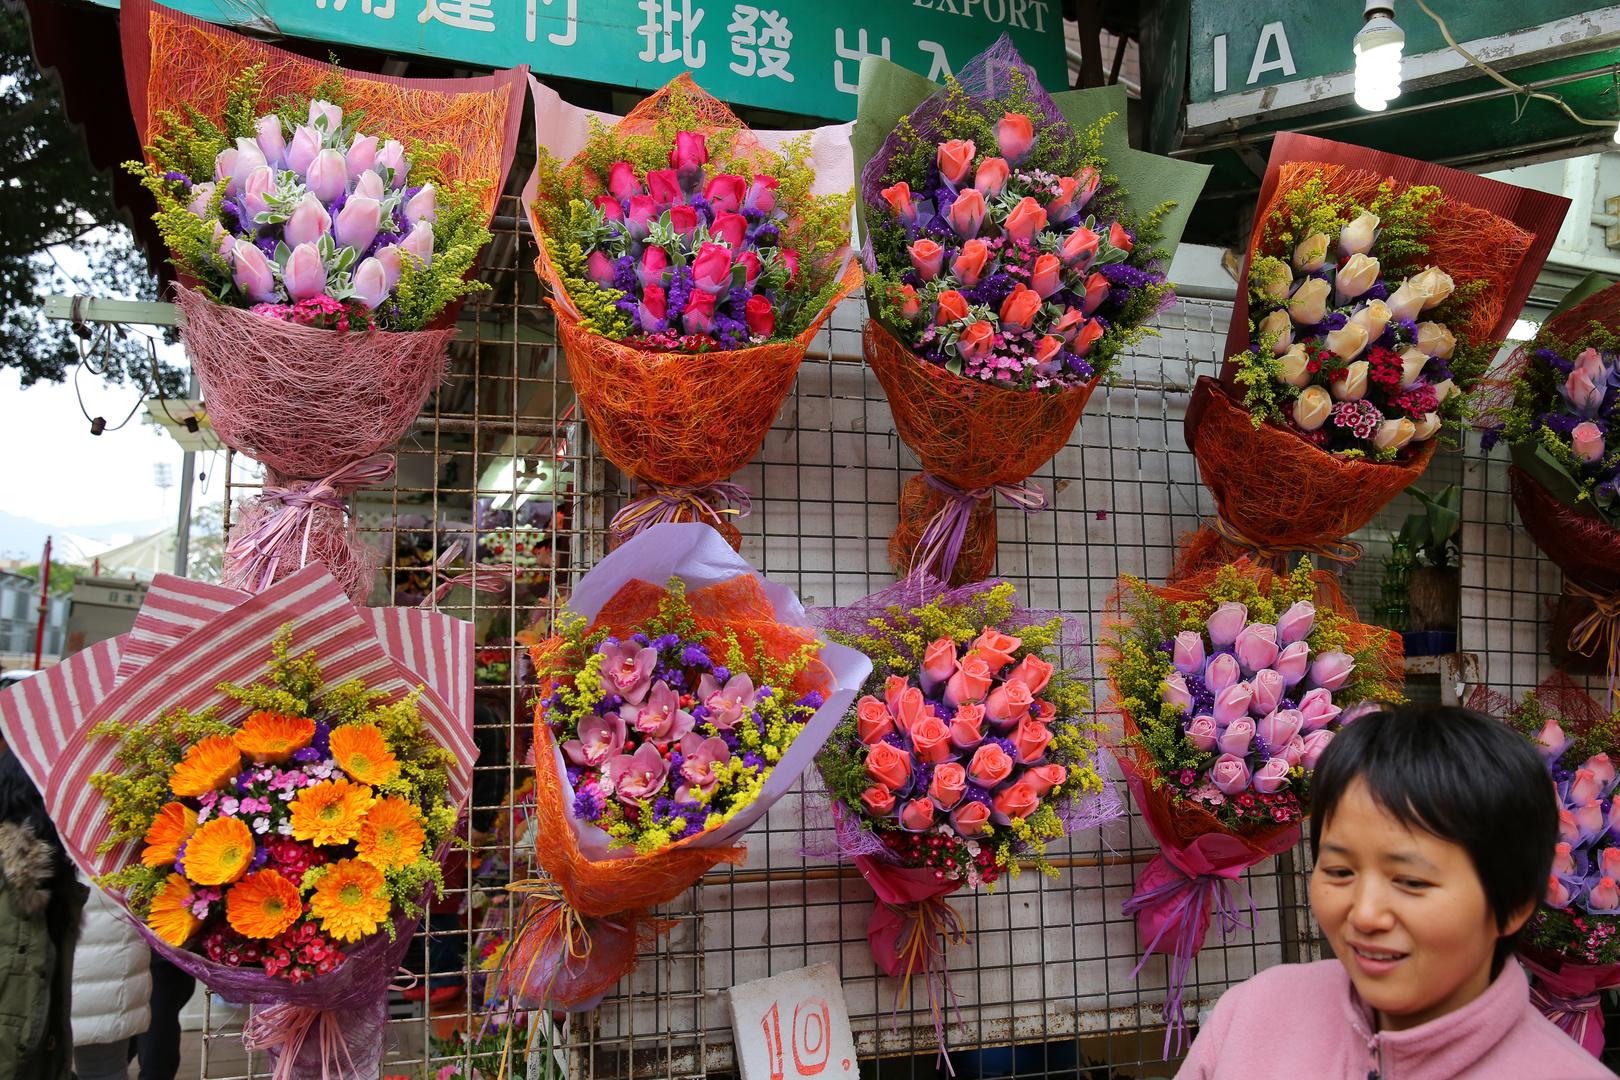 Monk Kok Blumenmarkt